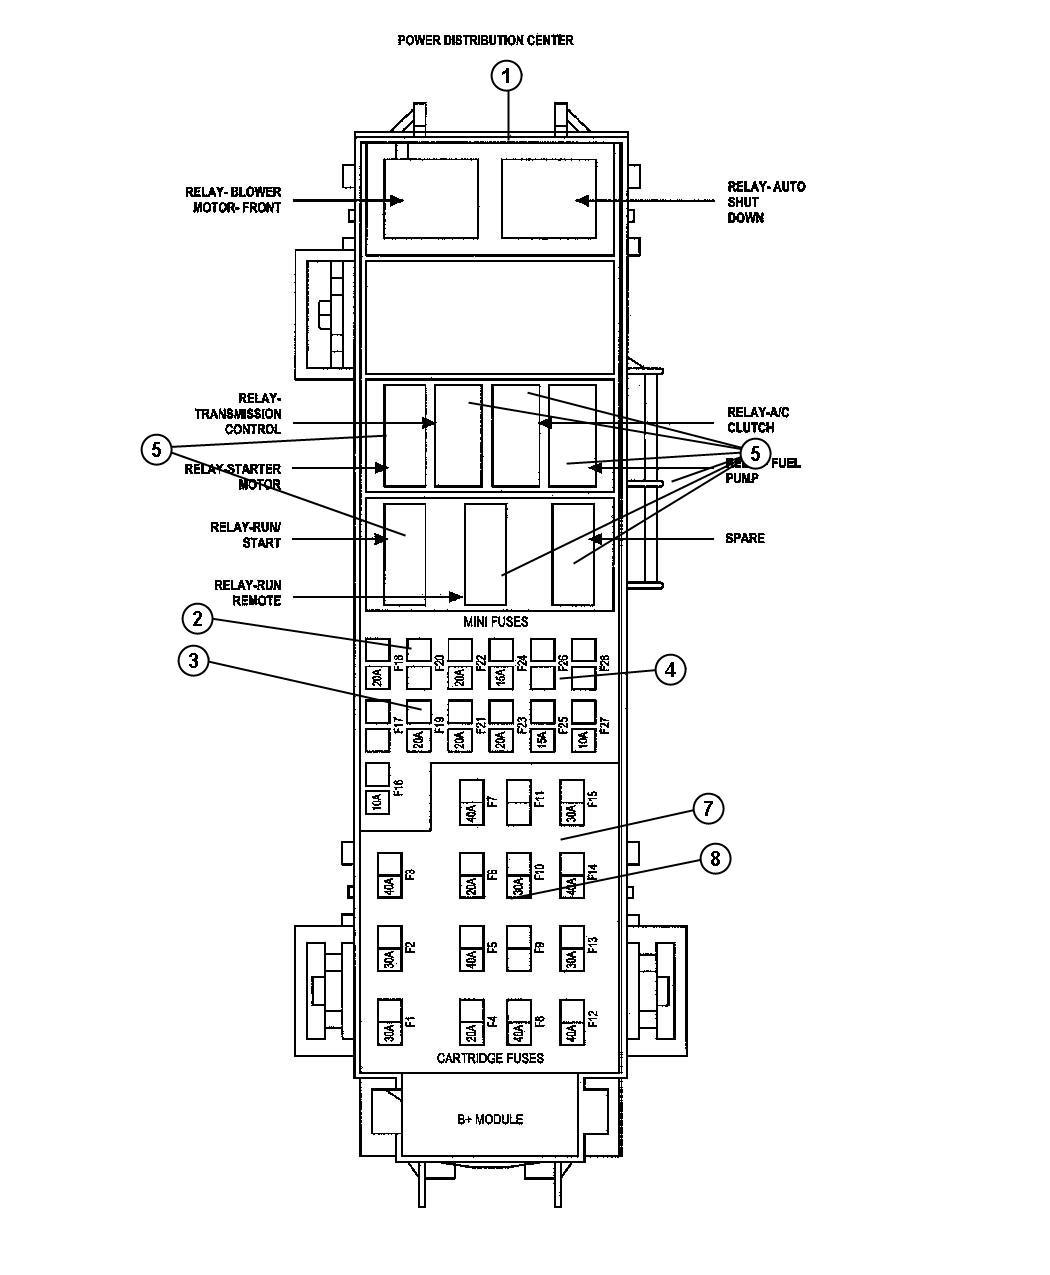 2004 dodge durango power distribution center